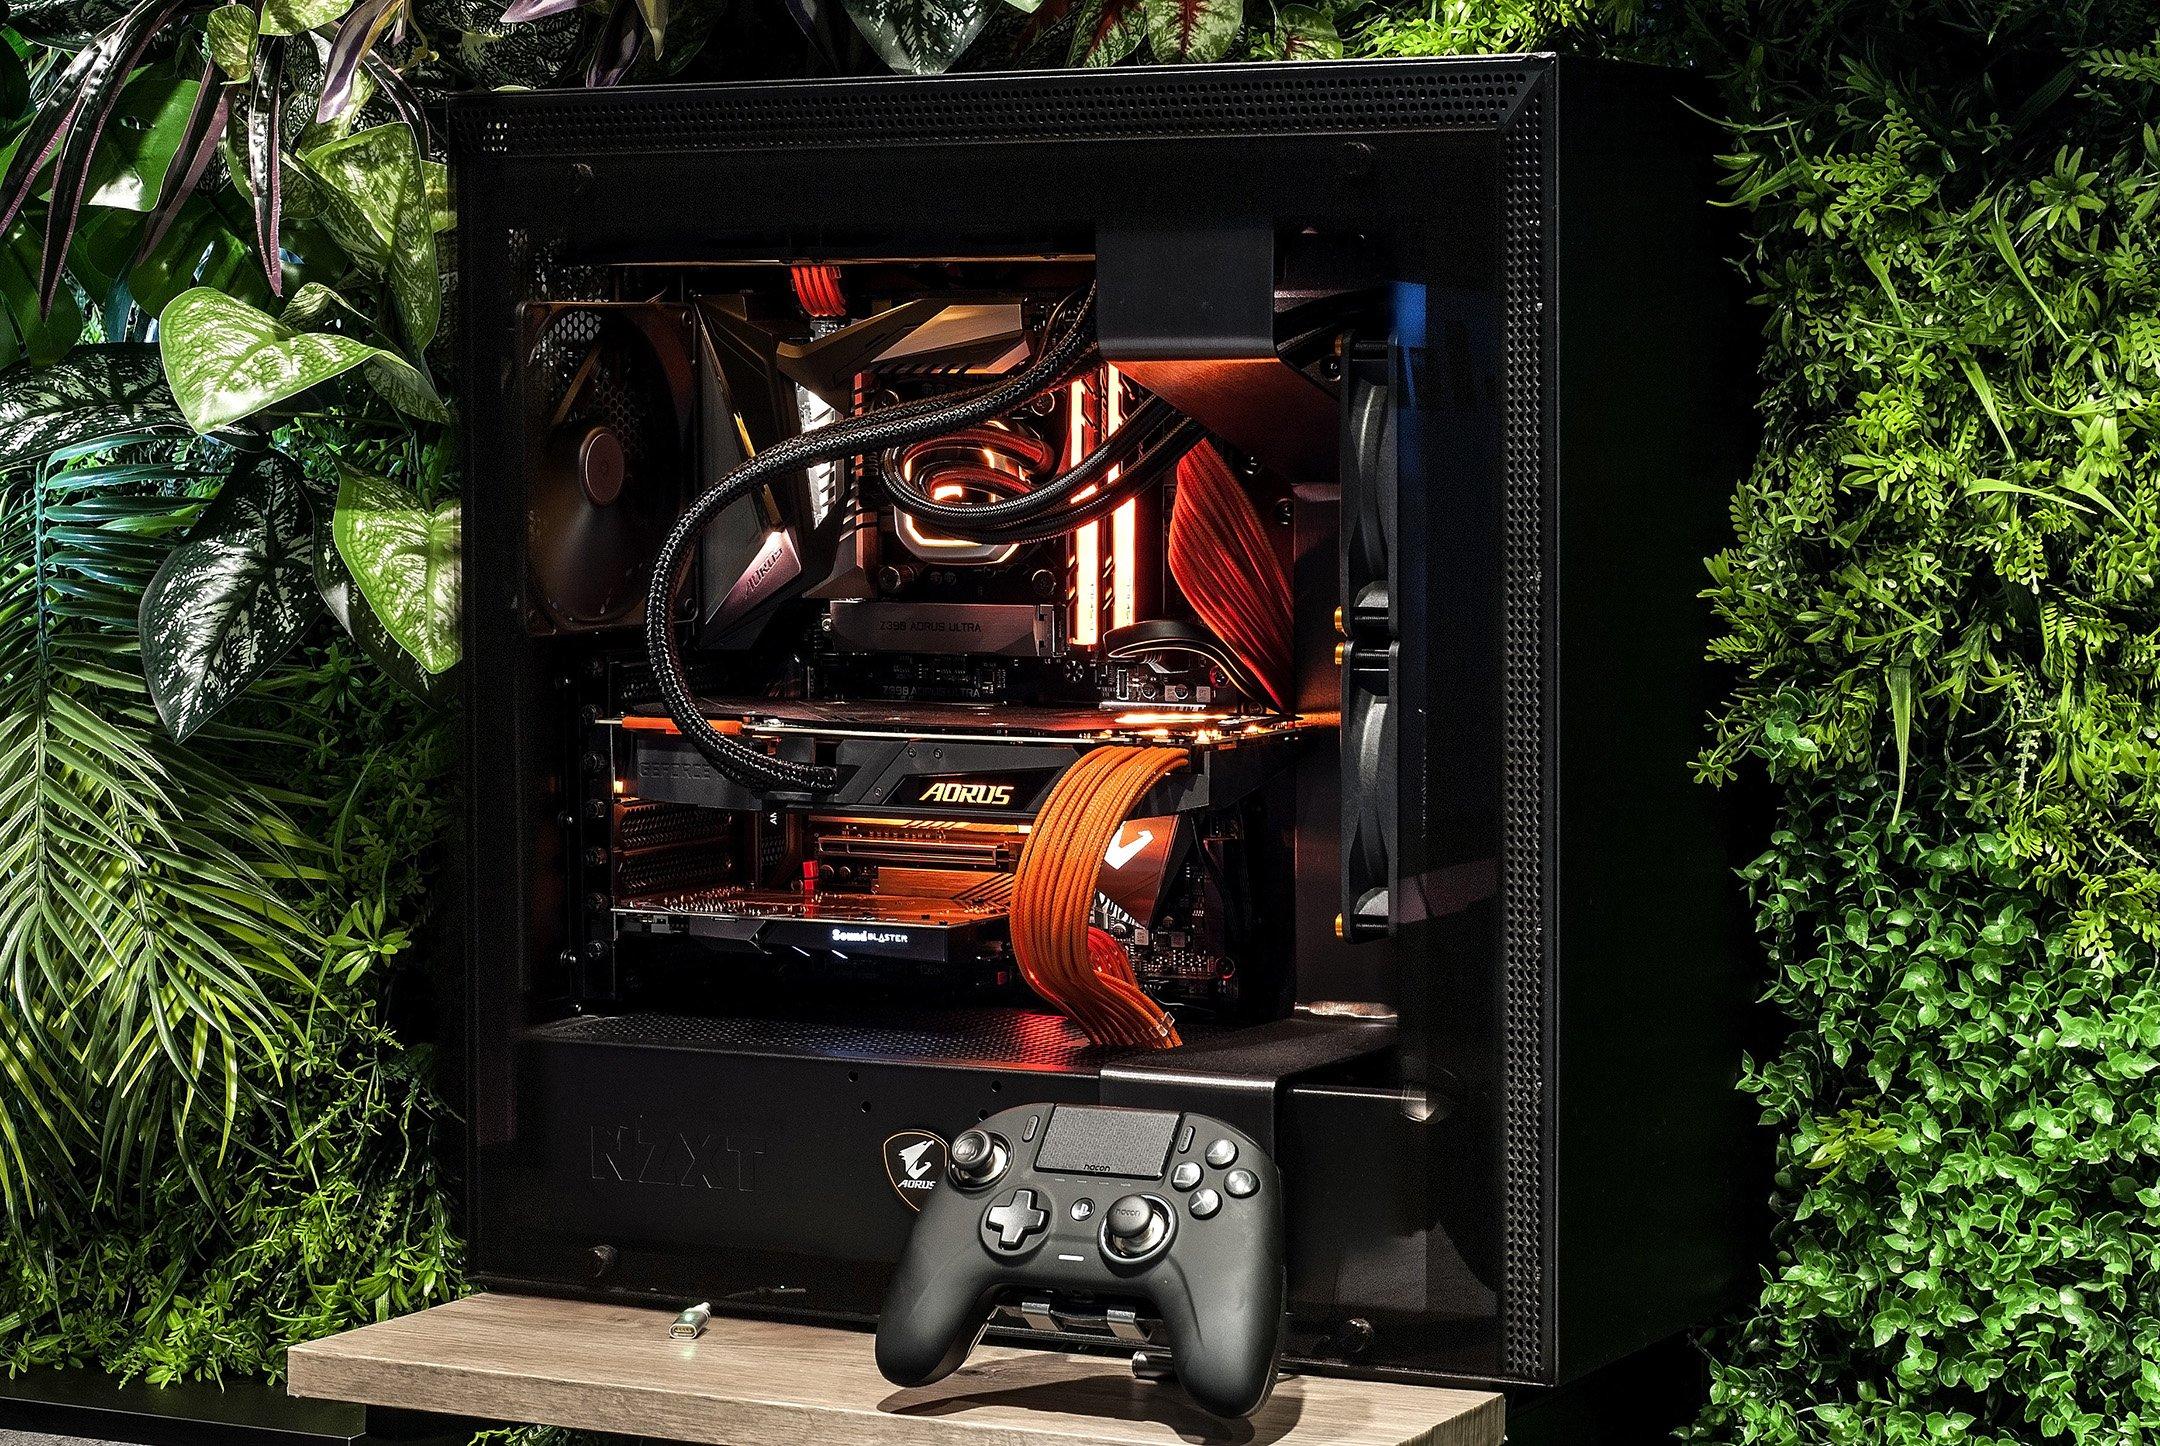 Close-up of AttackGem's PC build.